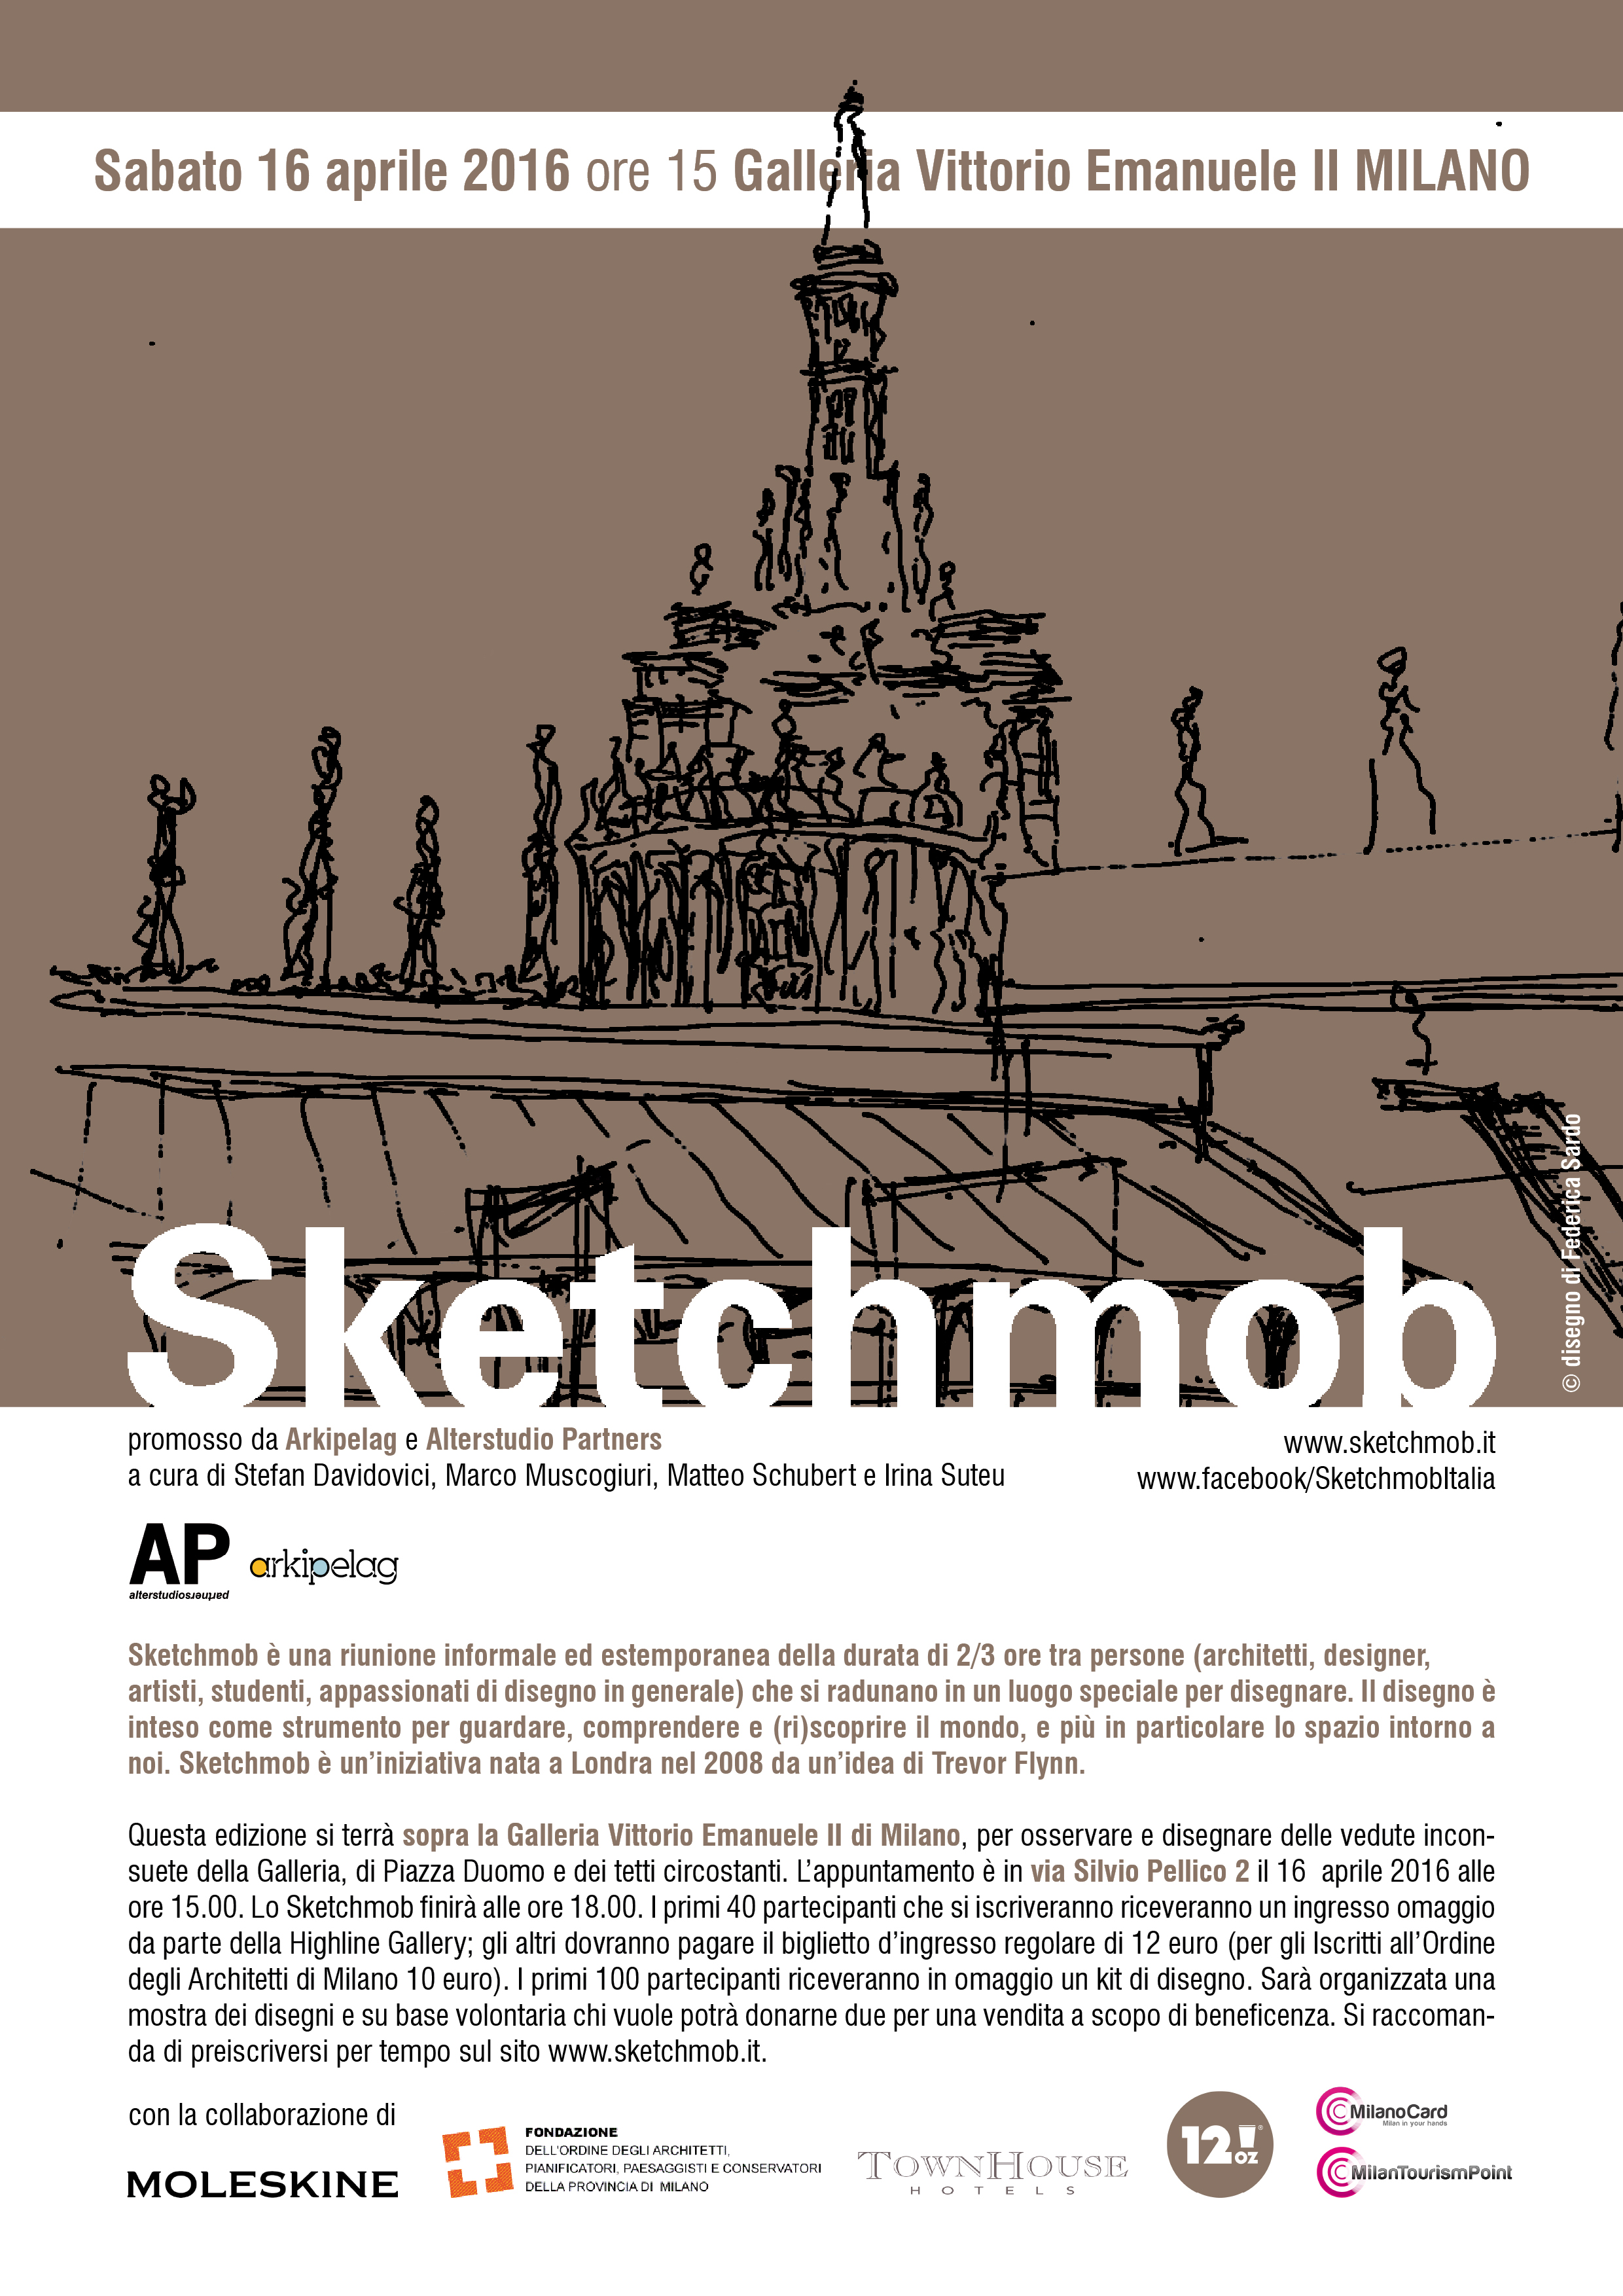 16.04.16 Sketchmob Galleria Vittorio Emanuele Milano (5)